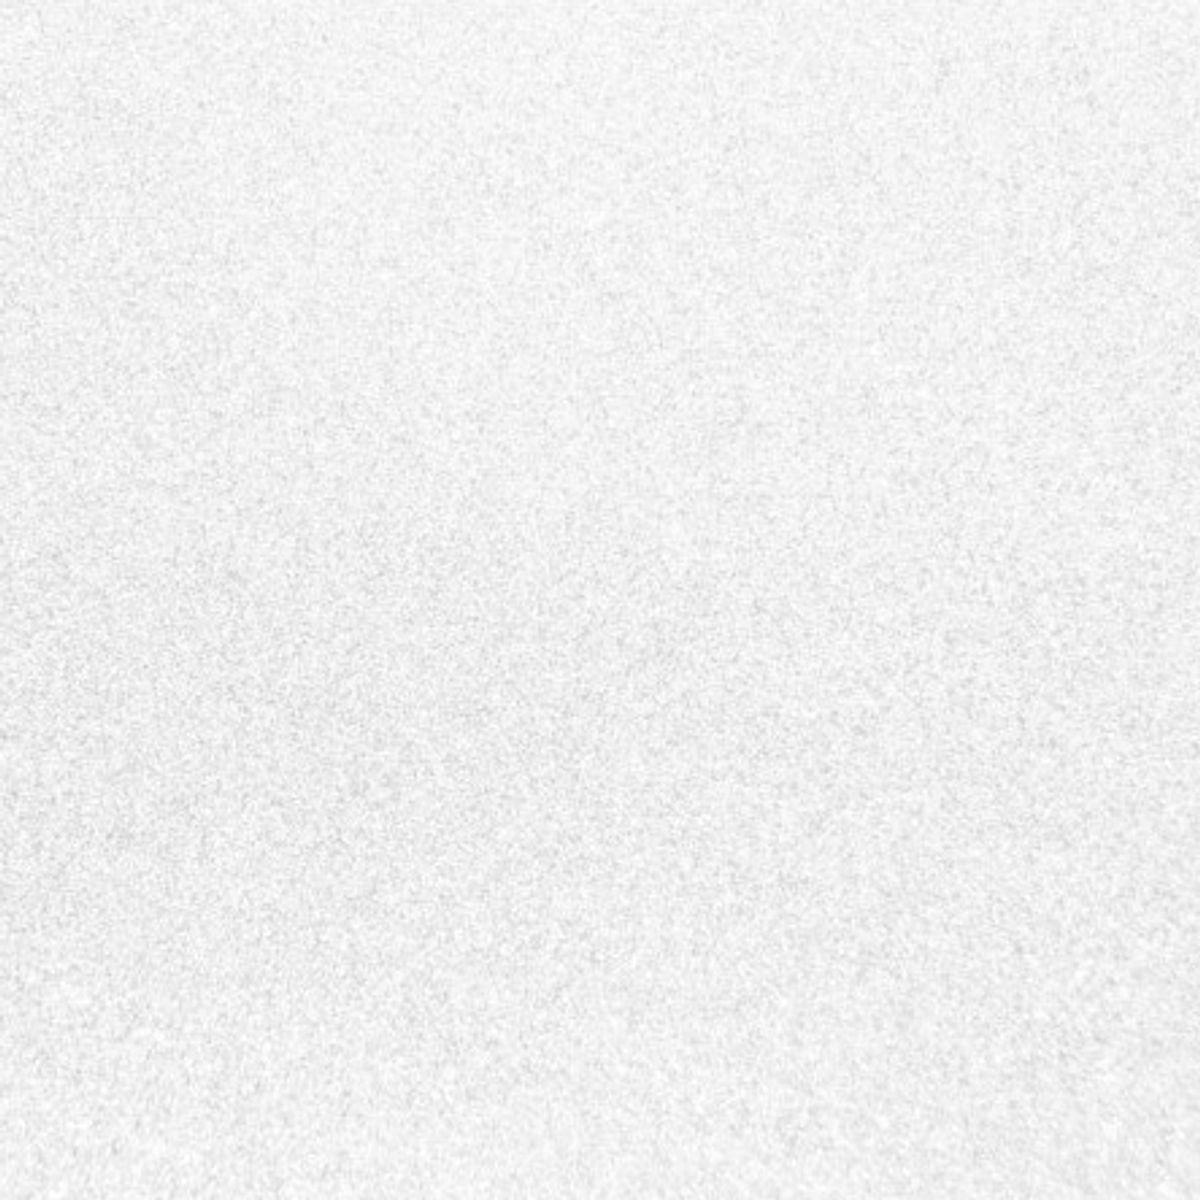 Tissu pailleté 66 x 45 cm - Blanc